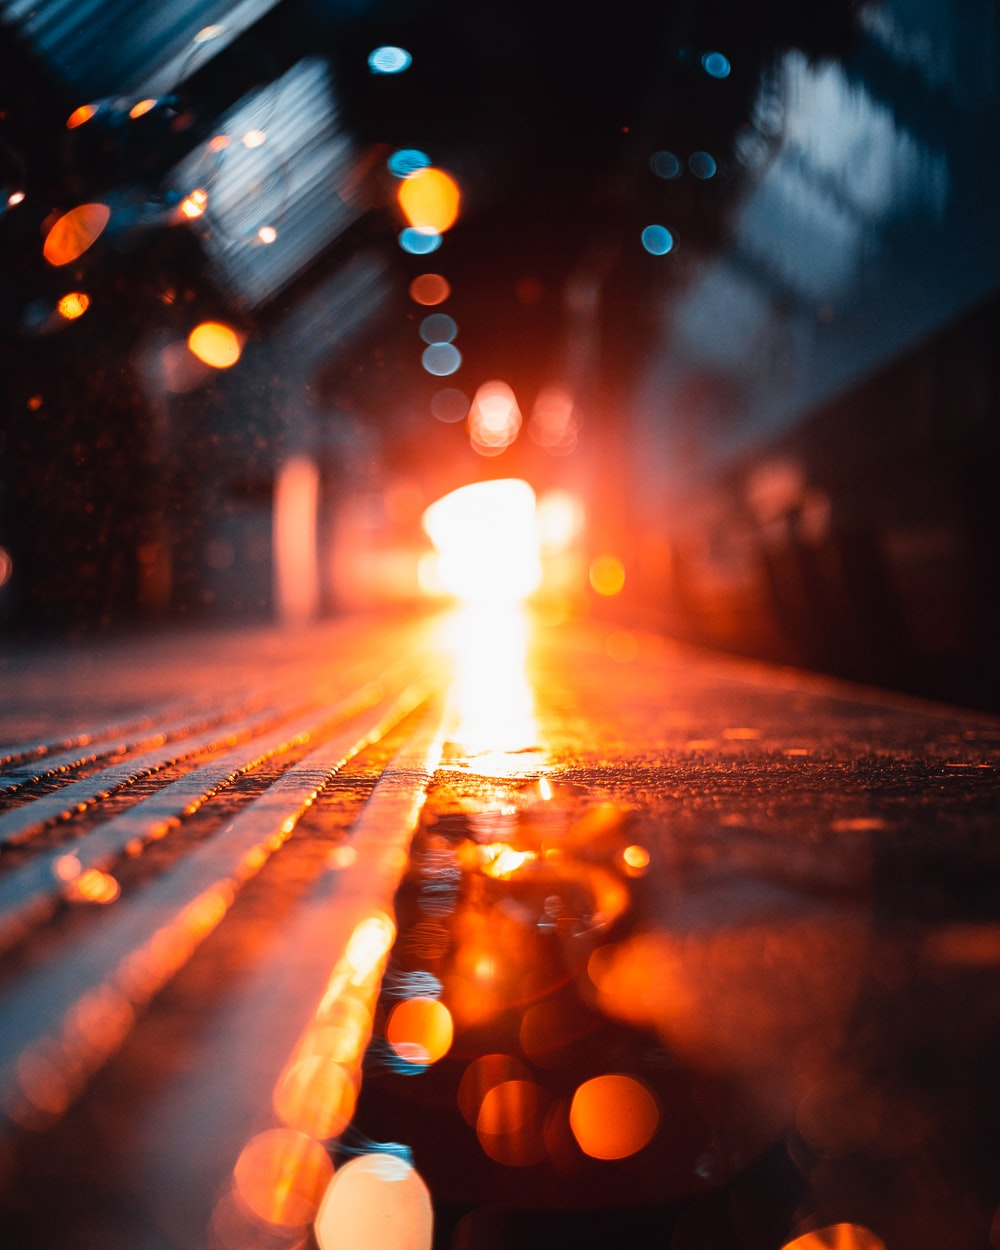 bokeh lights photography of road